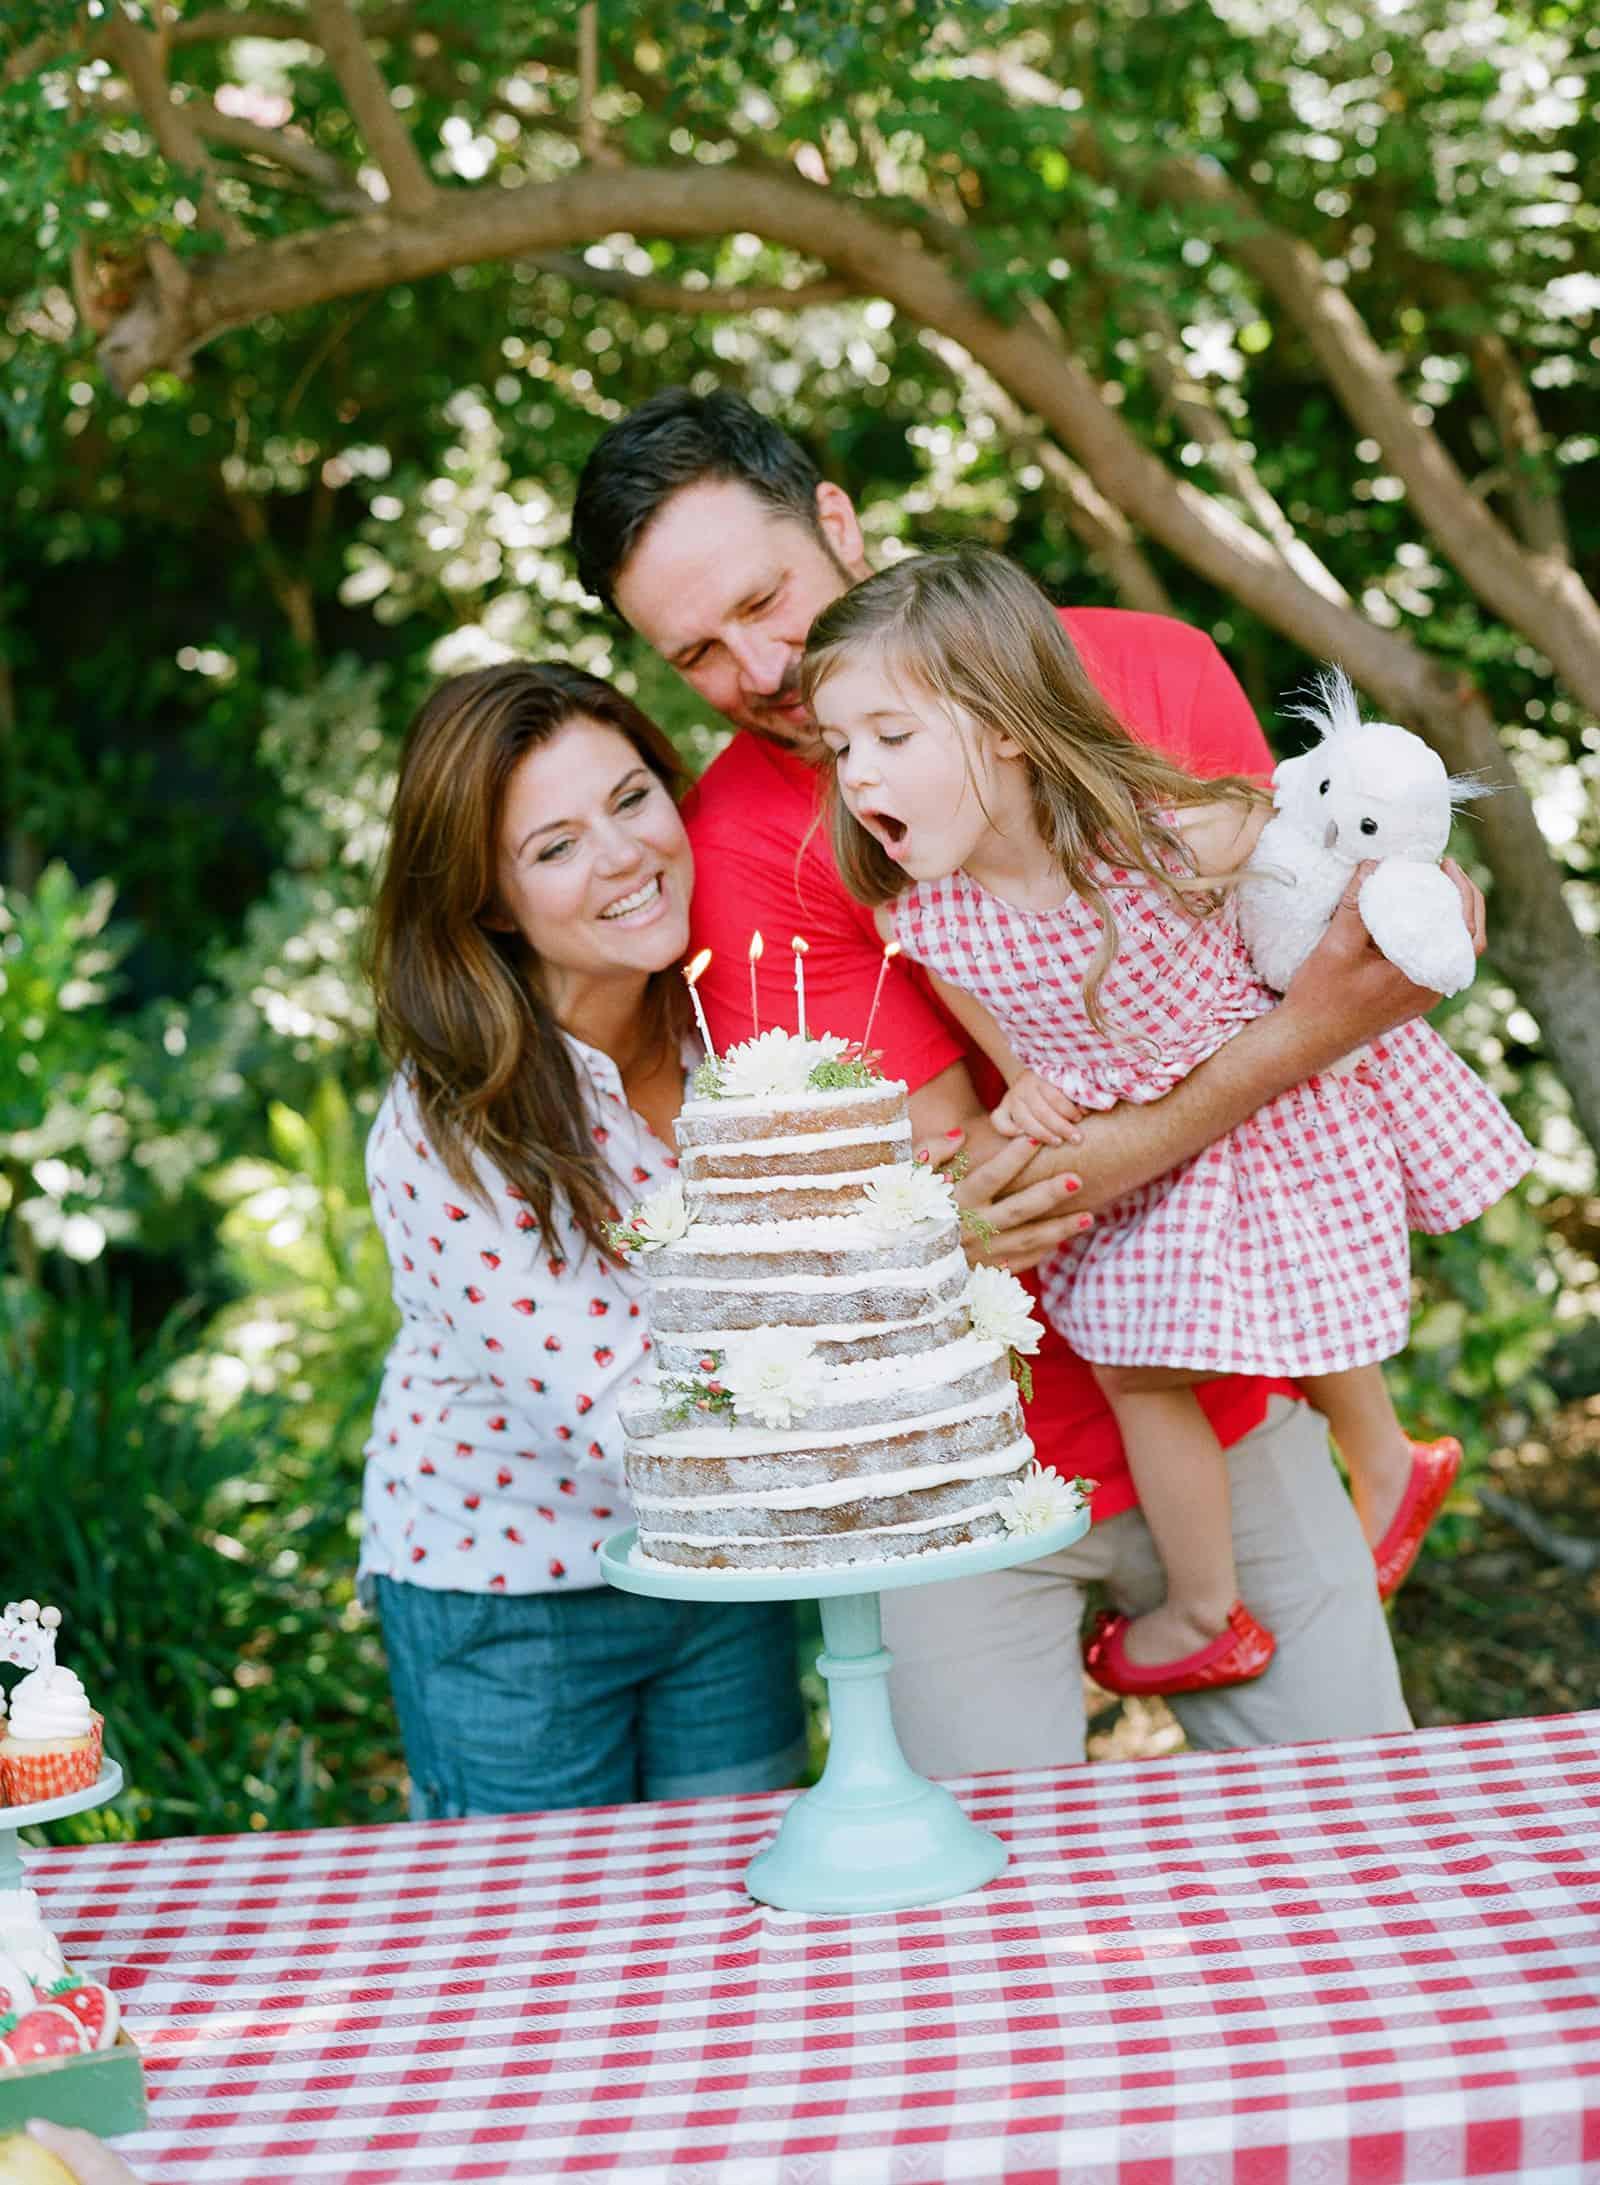 Strawberry Sweet - A Birthday Celebration by Tiffani Thiessen. Photos by Elizabeth Messina